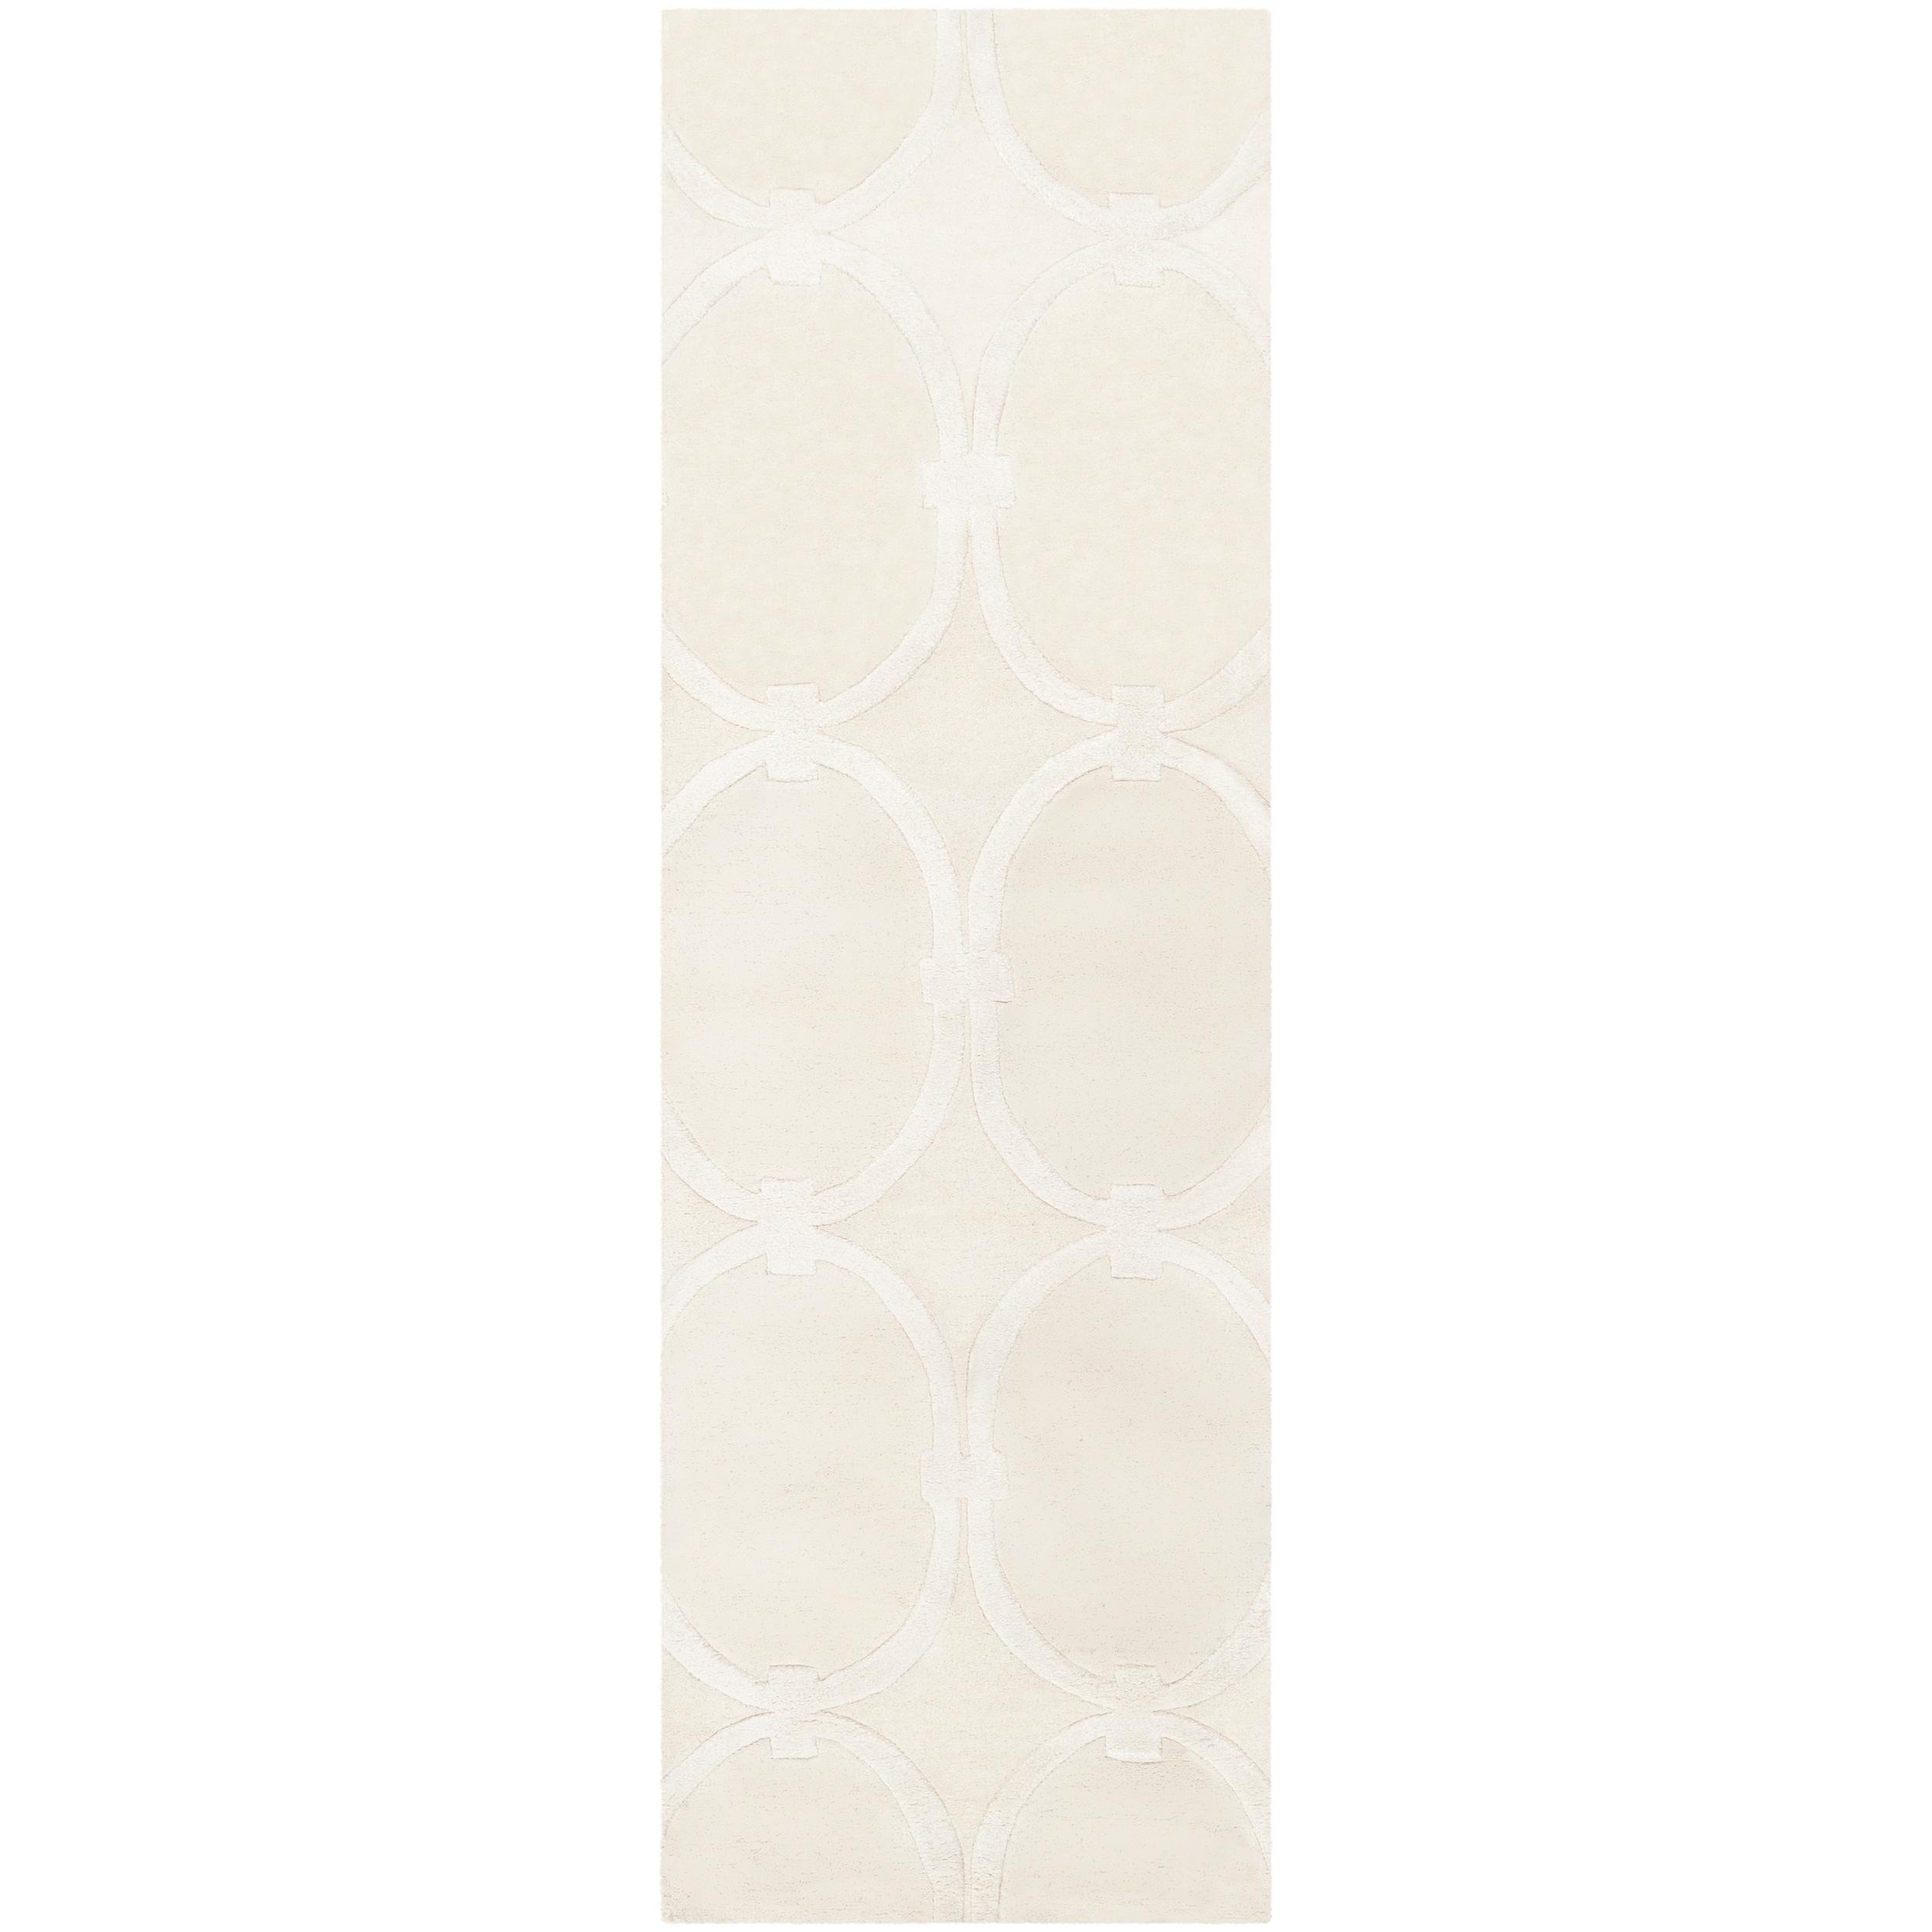 Hand-tufted White Cane Trellis Pattern Wool Rug (2'6 x 8')